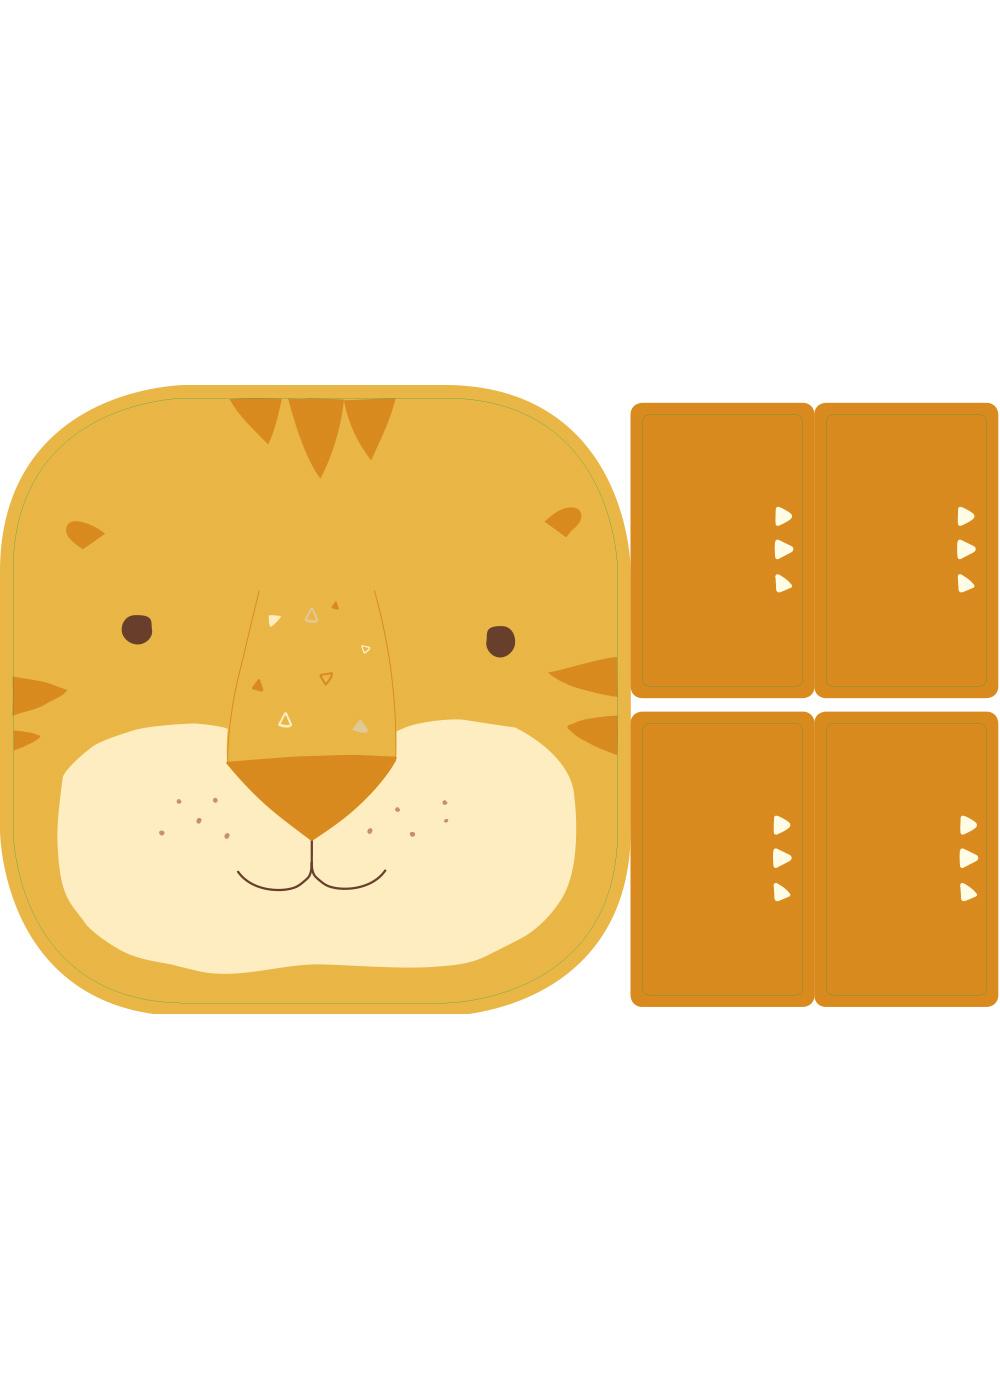 klebefolie ikea flisat kinderhocker tierig tiger 5